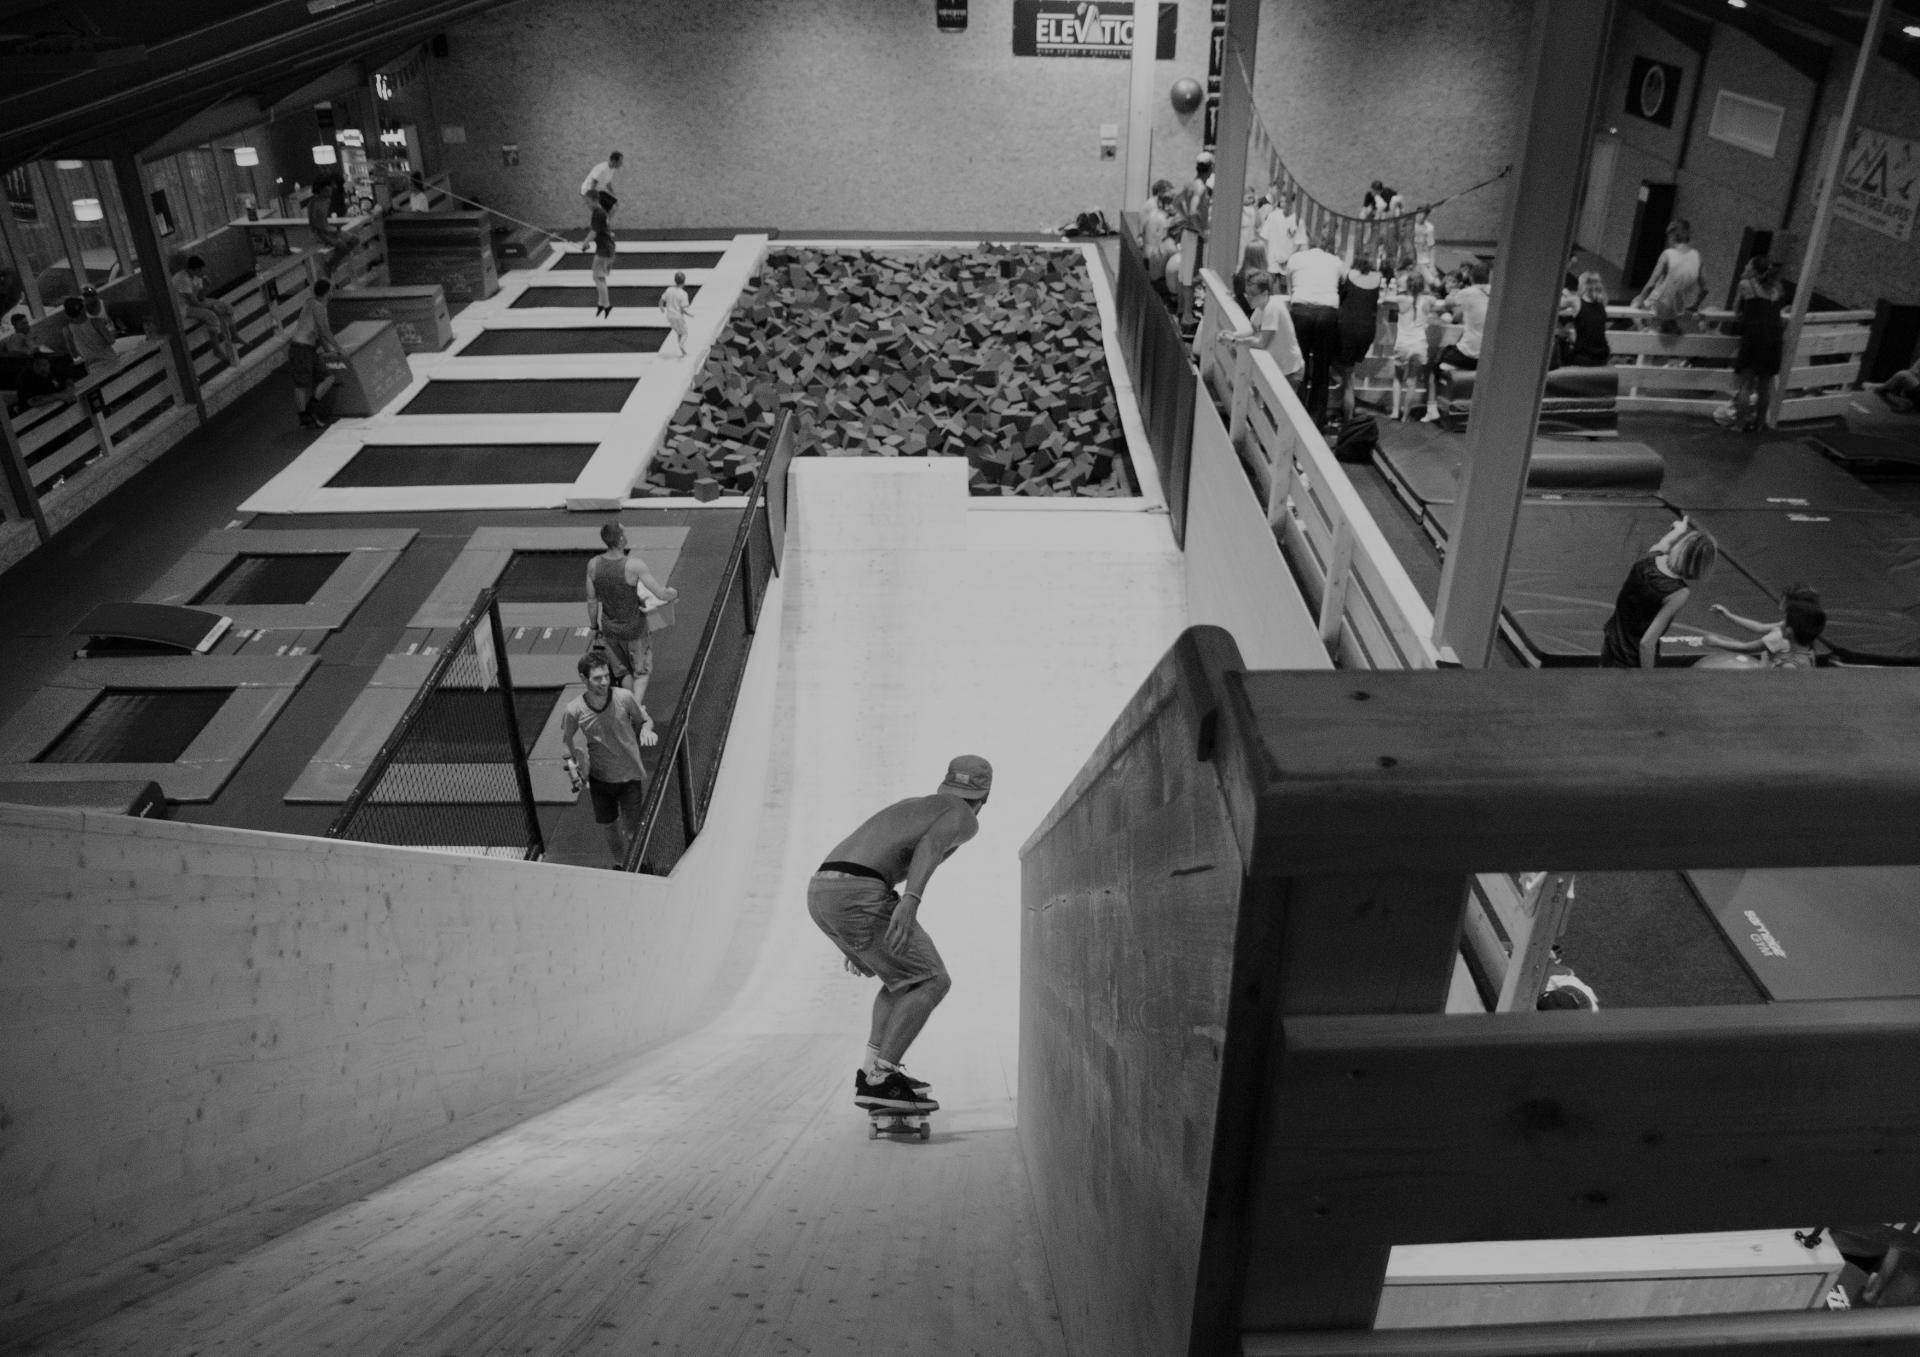 Skate rampe a4